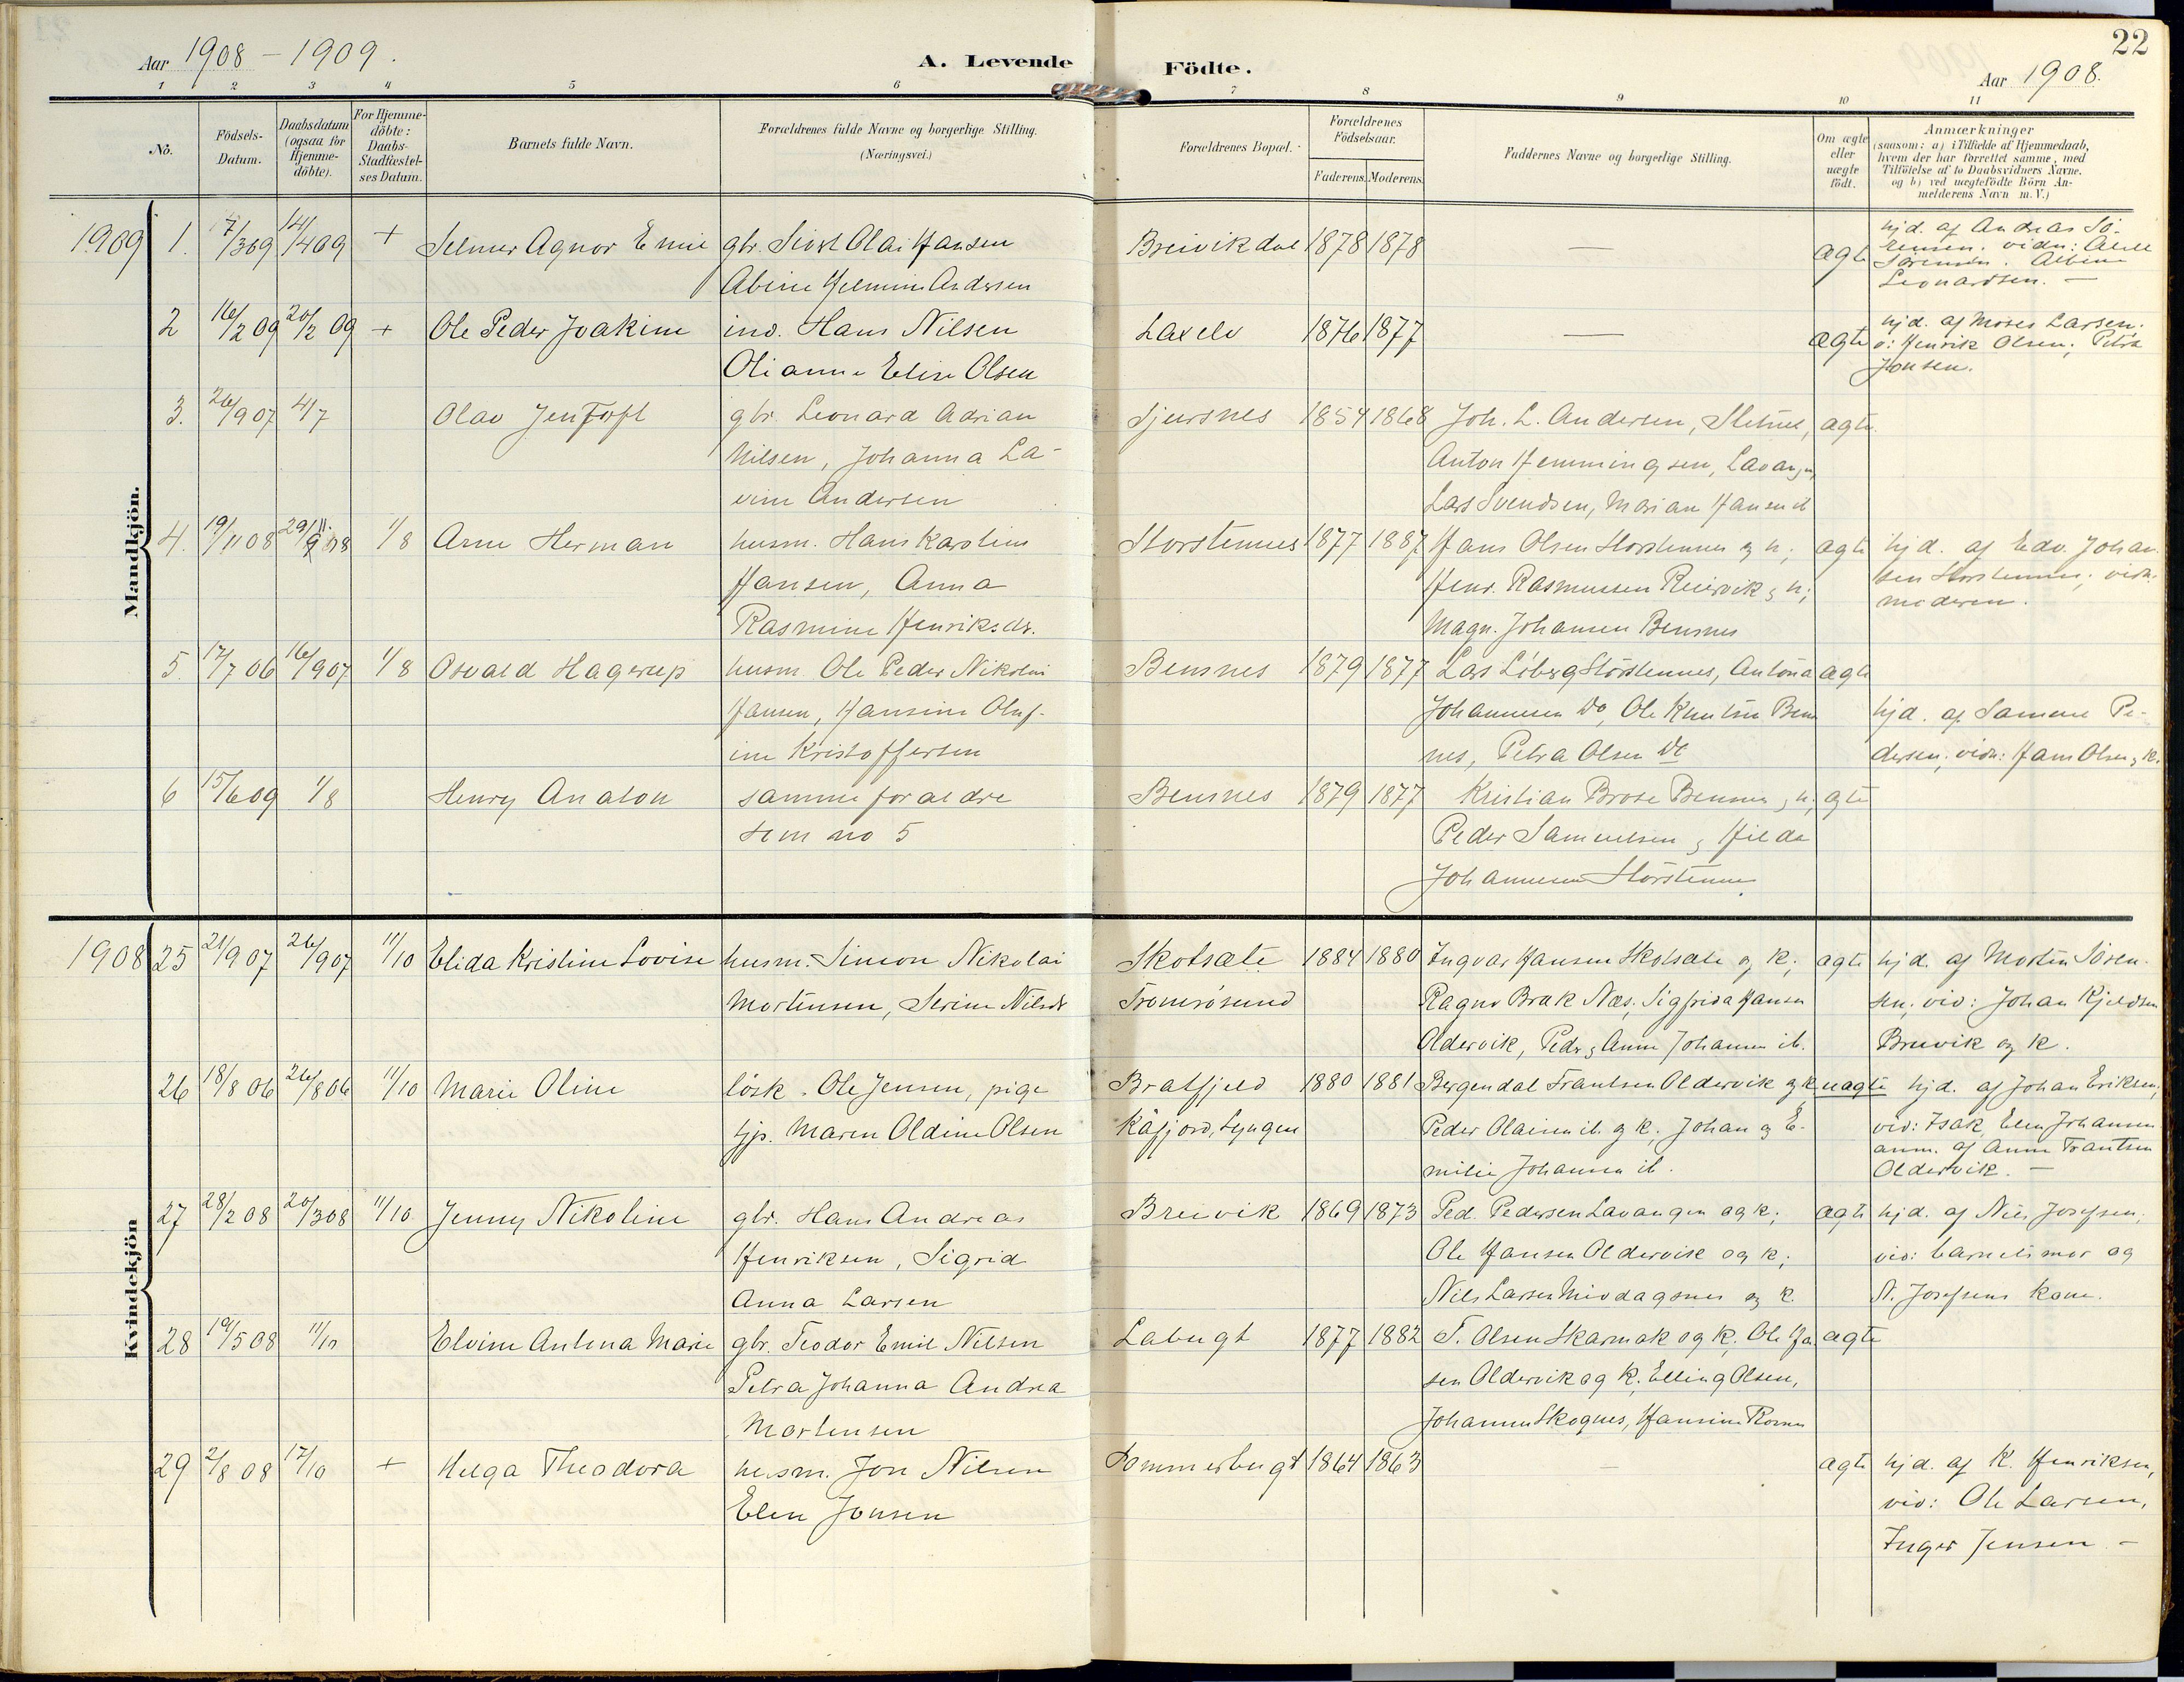 SATØ, Lyngen sokneprestembete, Ministerialbok nr. 14, 1905-1920, s. 22